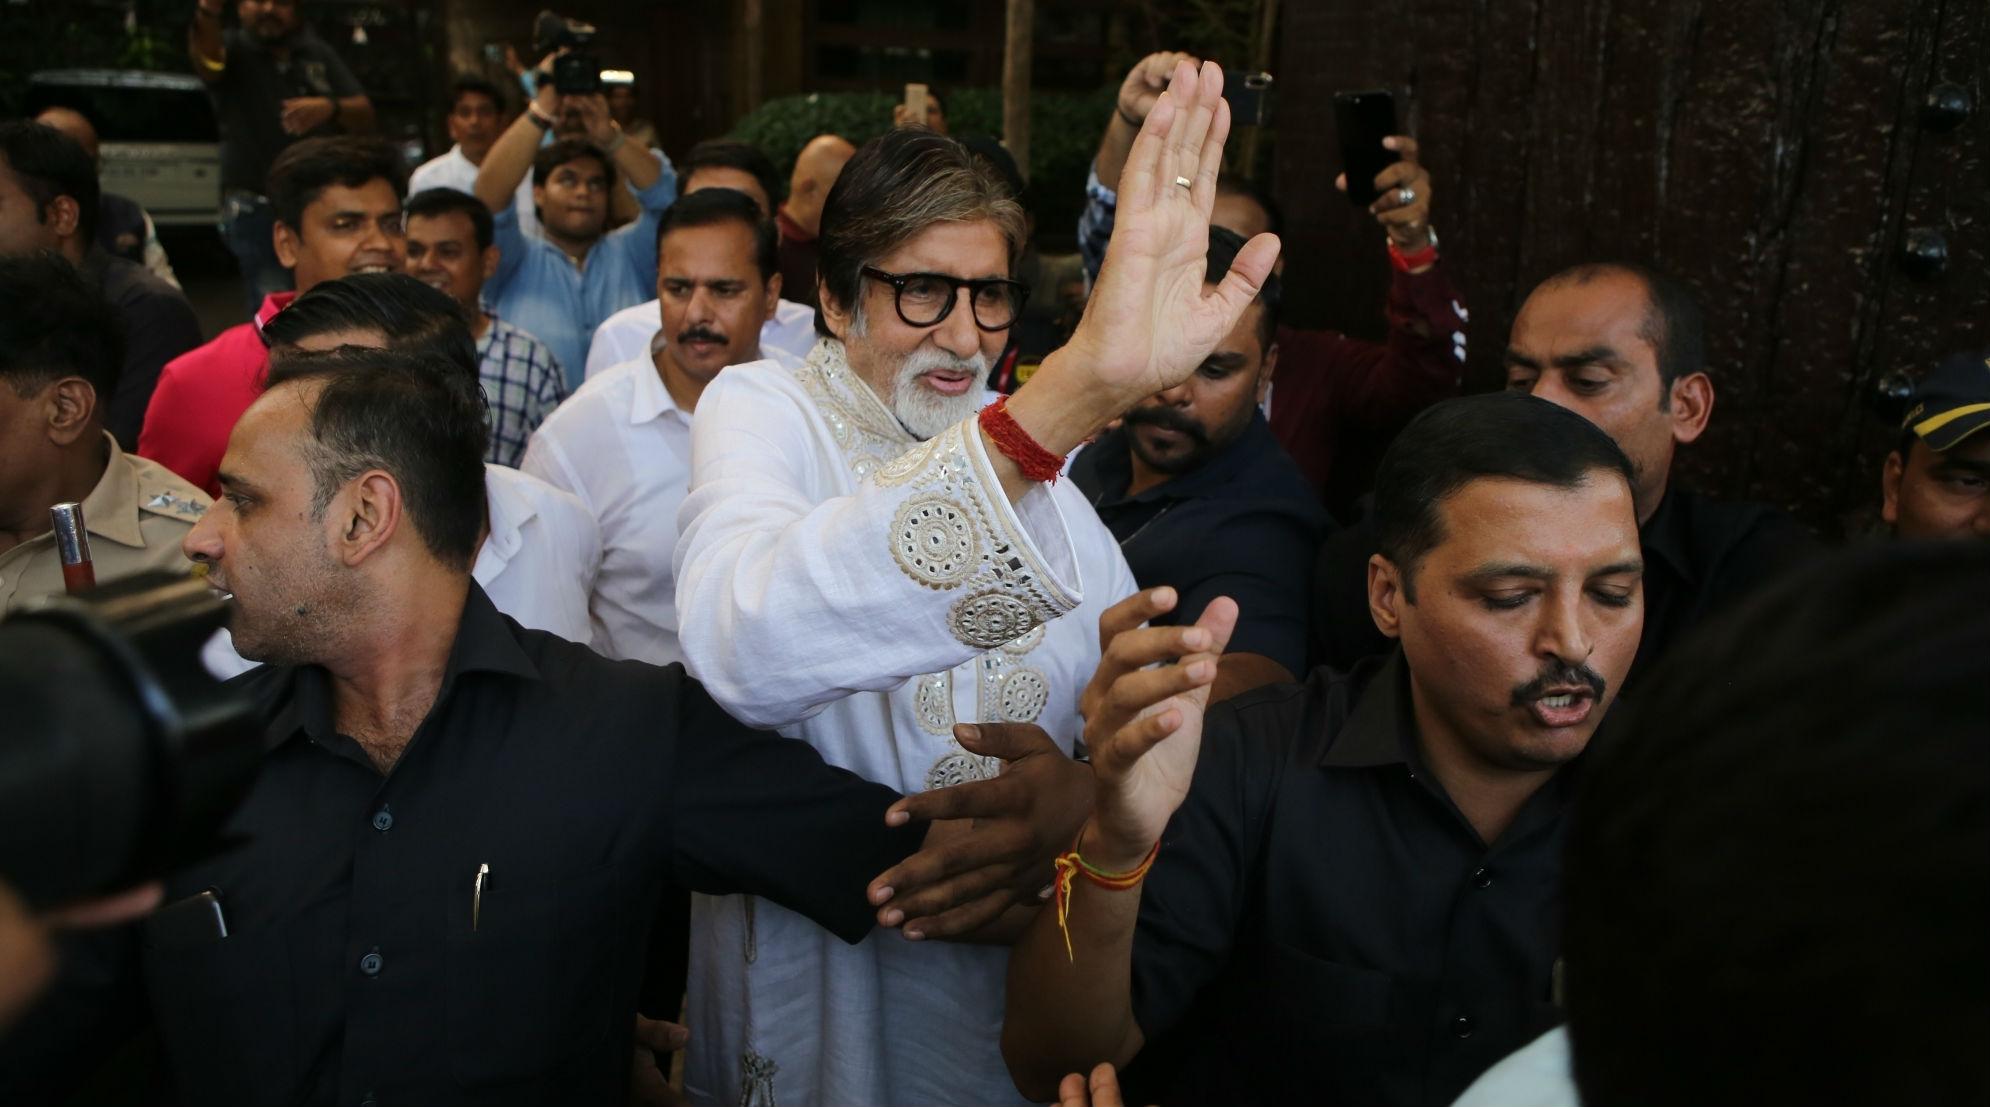 Amitabh Bachchan Health Update: The KBC 11 Host Loses 5 Kilos after Hospitalisation